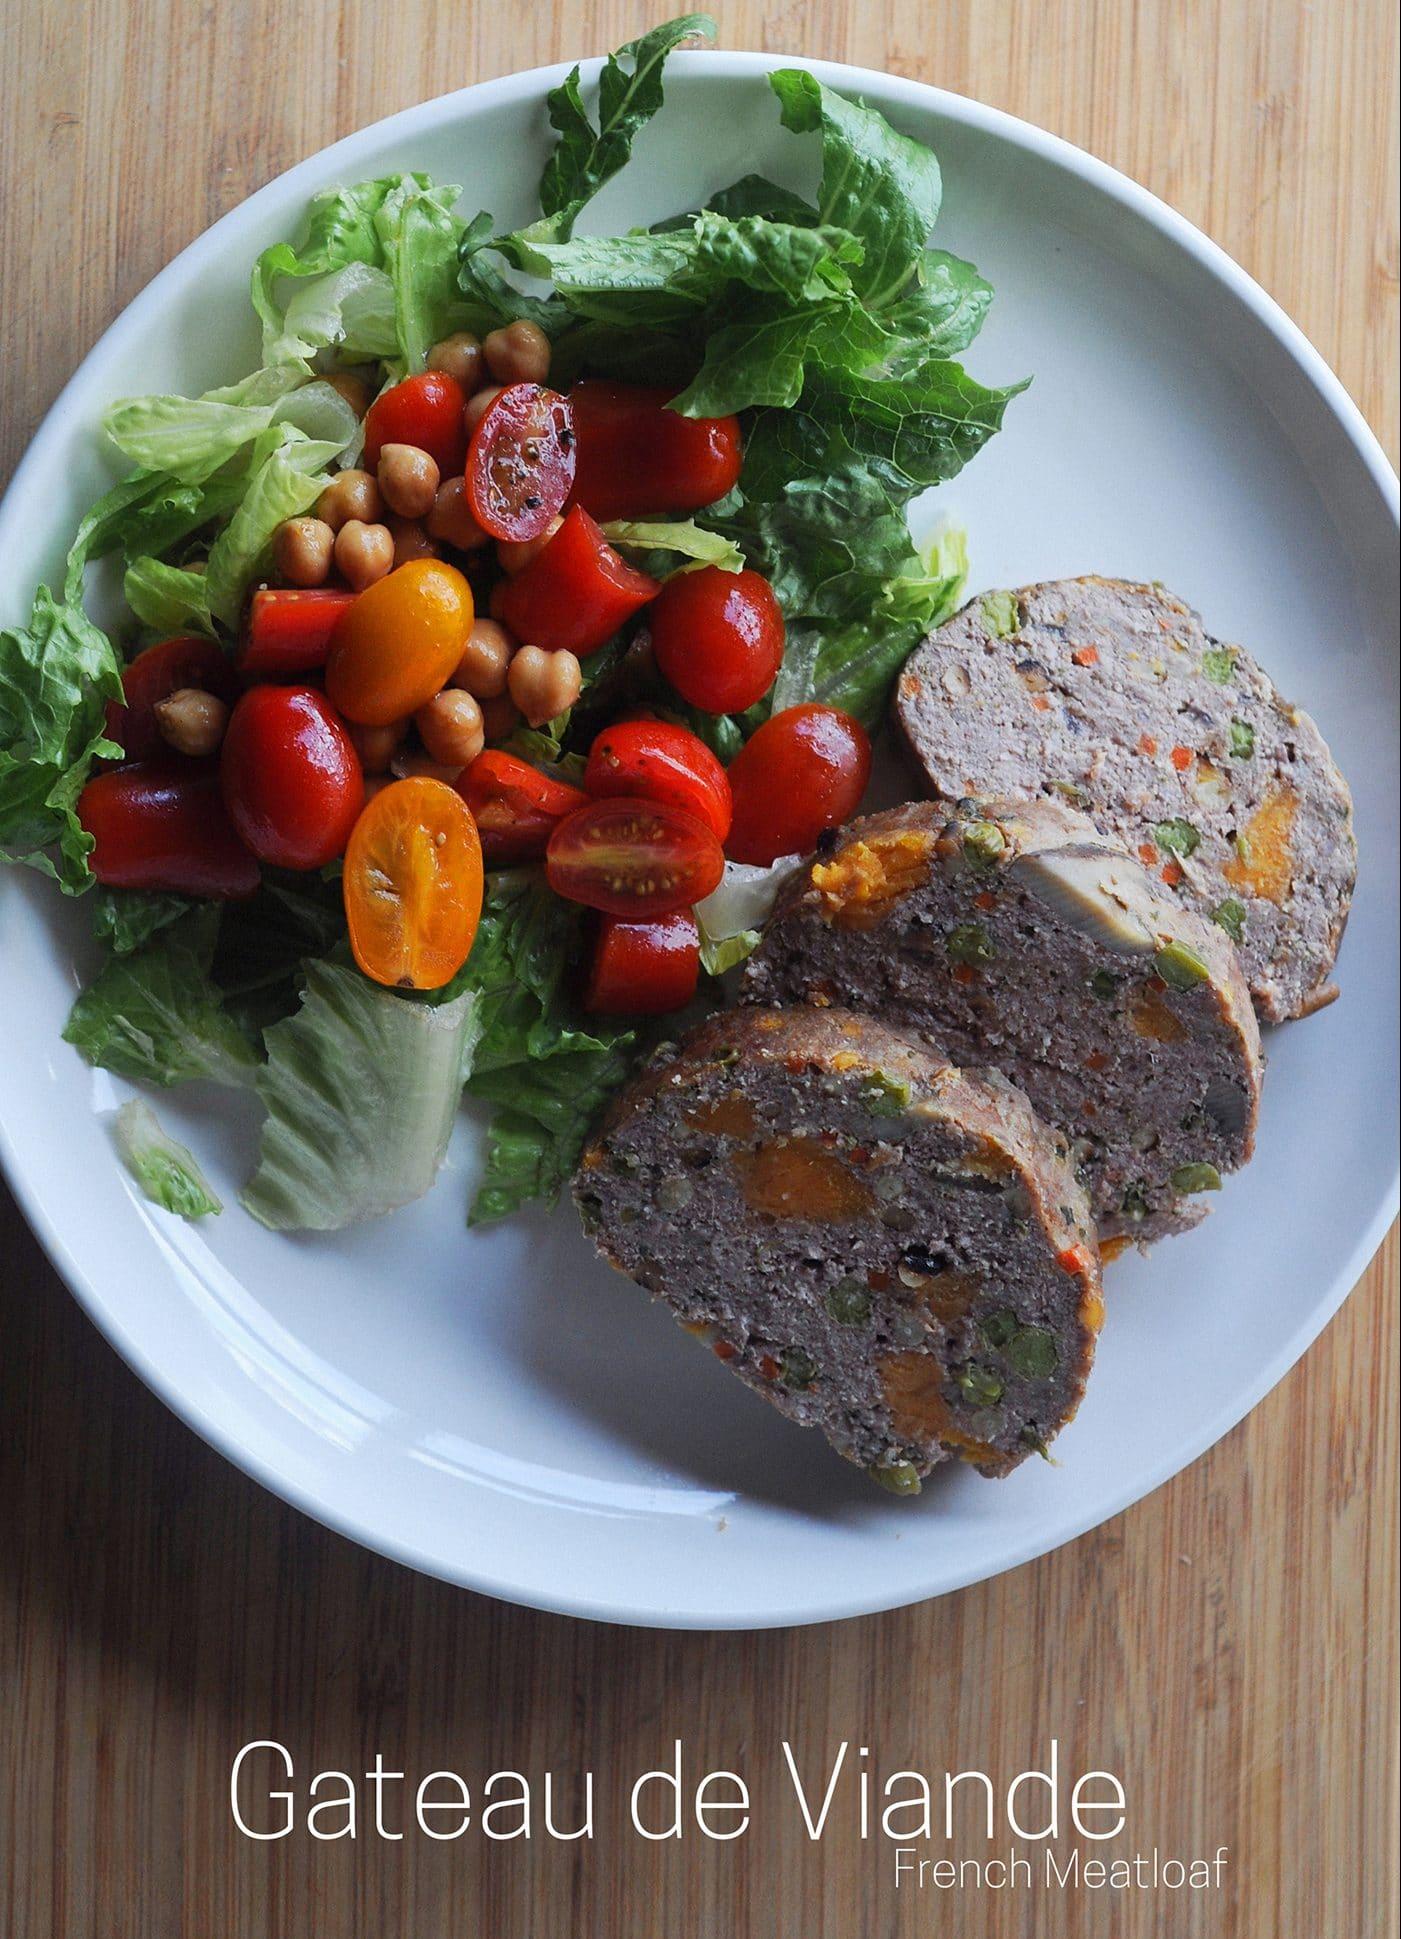 French Meatloaf - Gateau de Viande